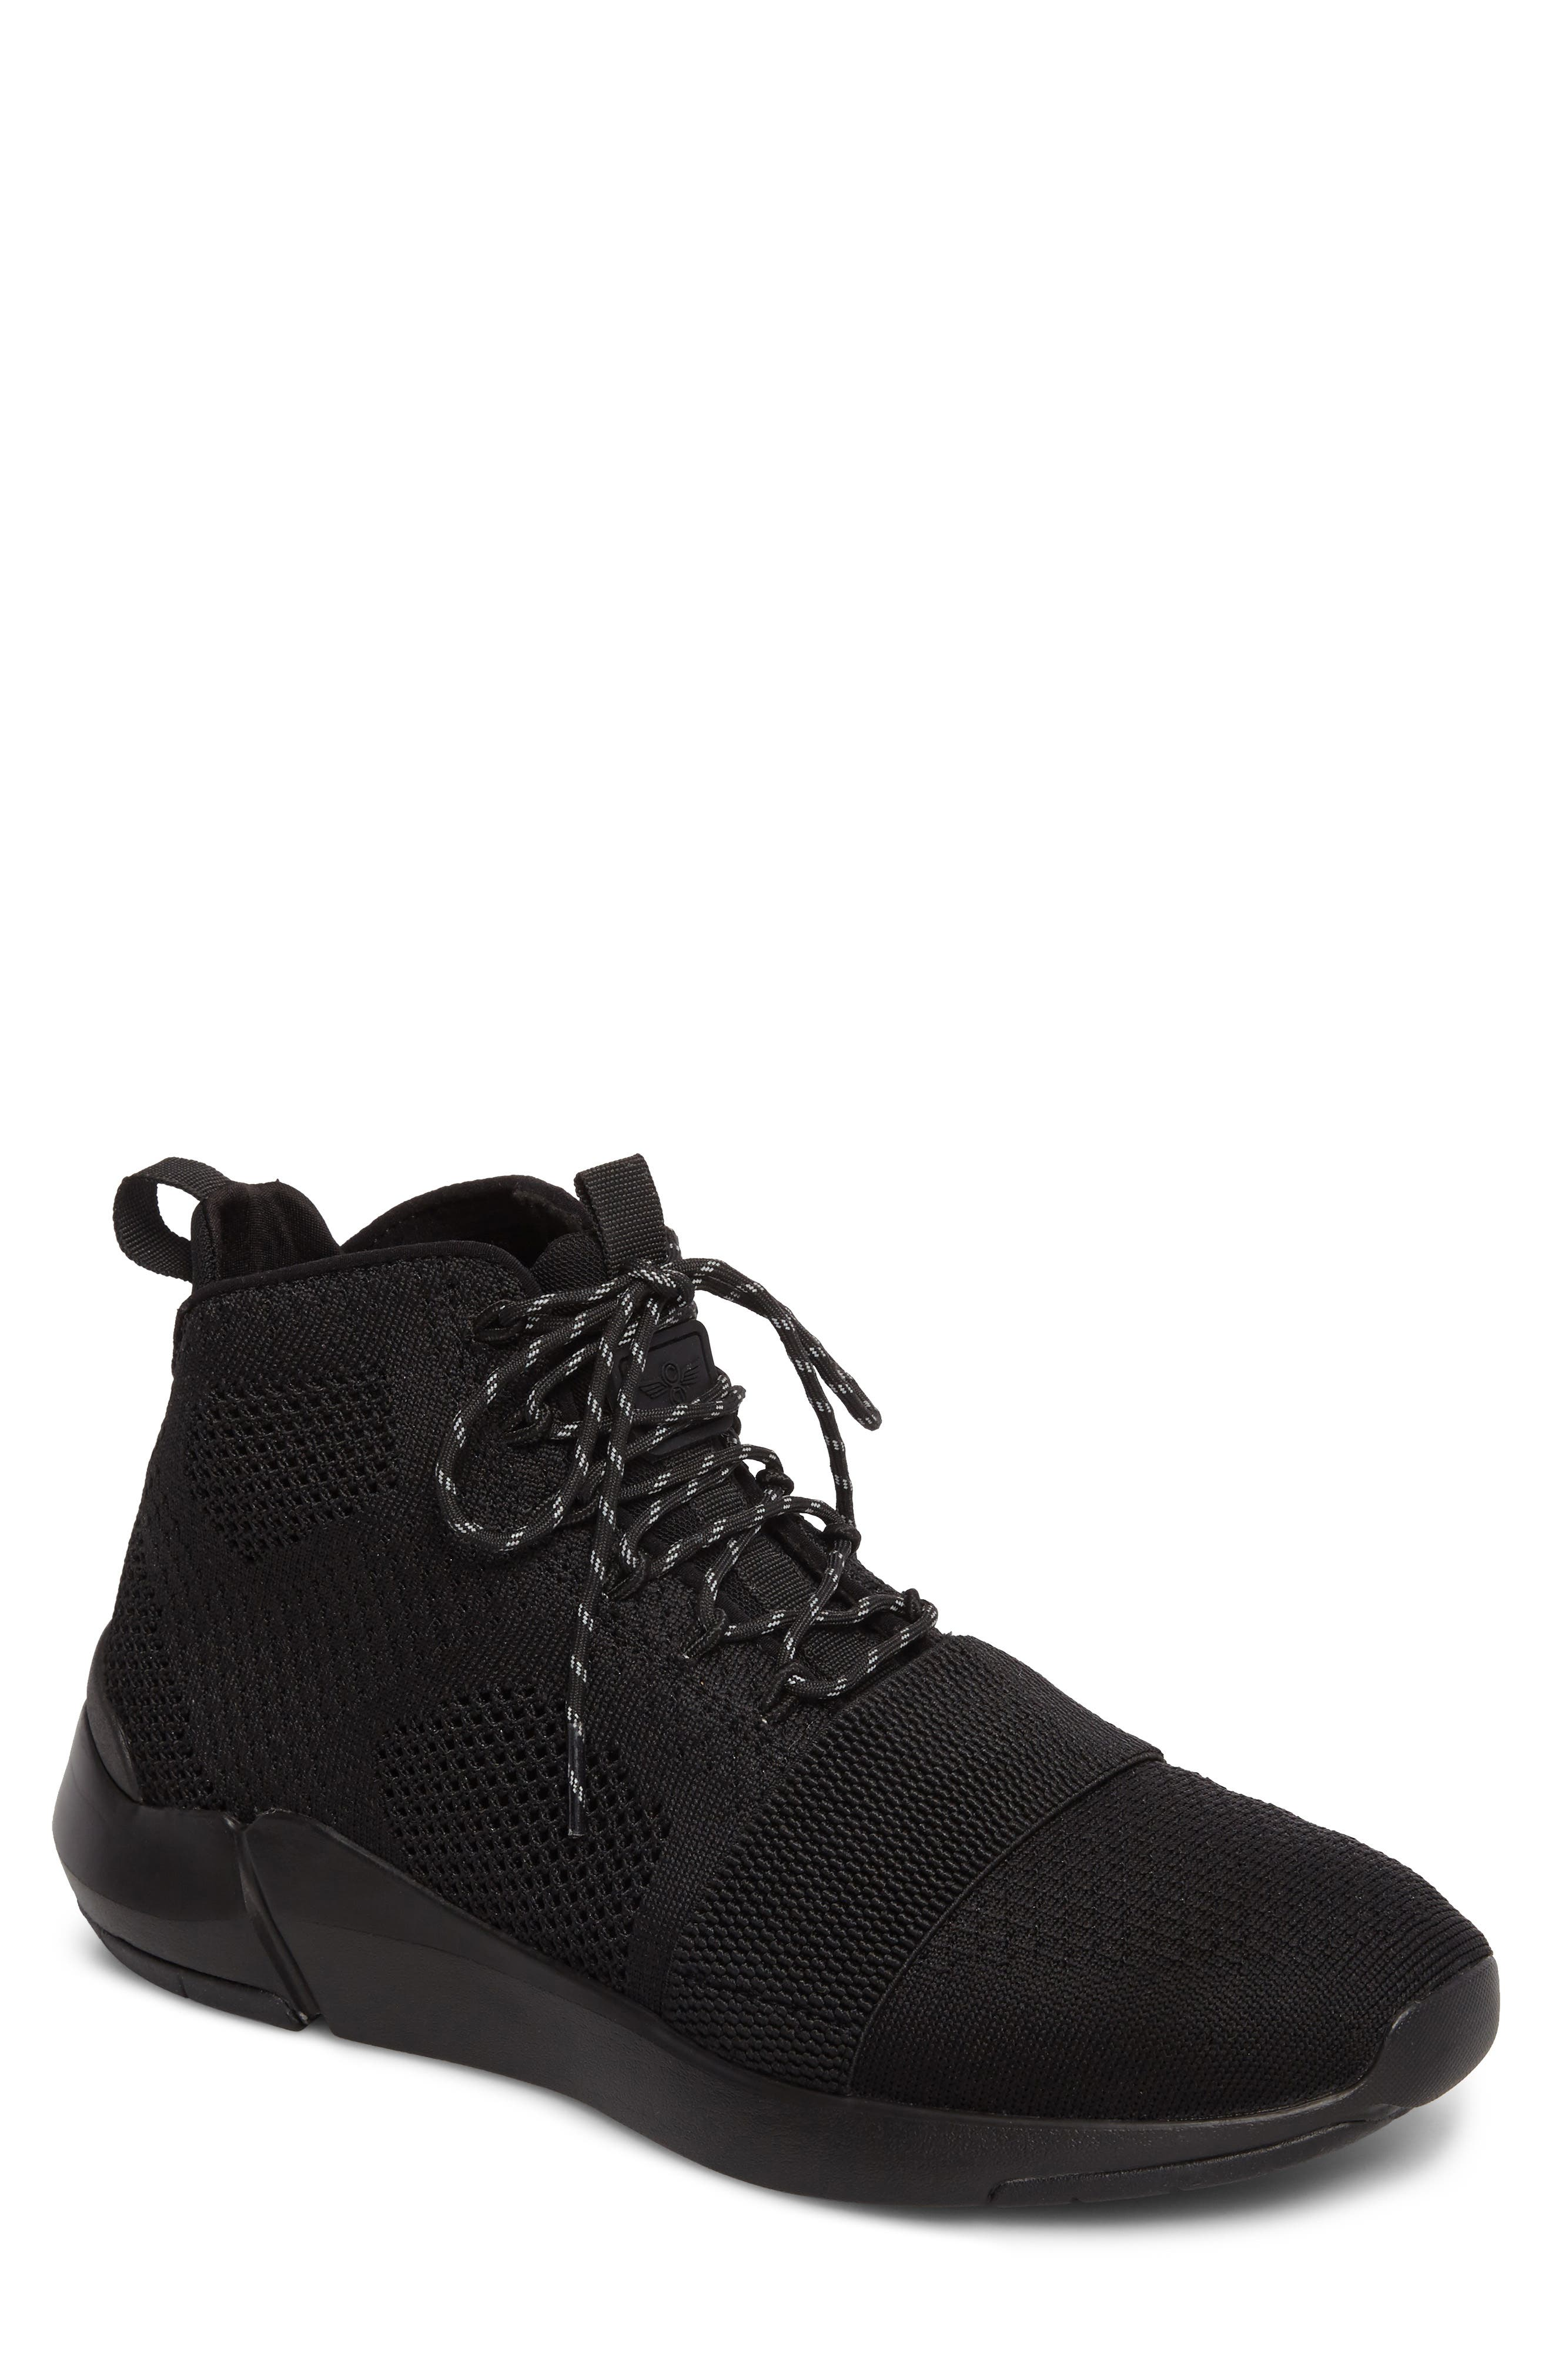 Modica Sneaker,                             Main thumbnail 1, color,                             012